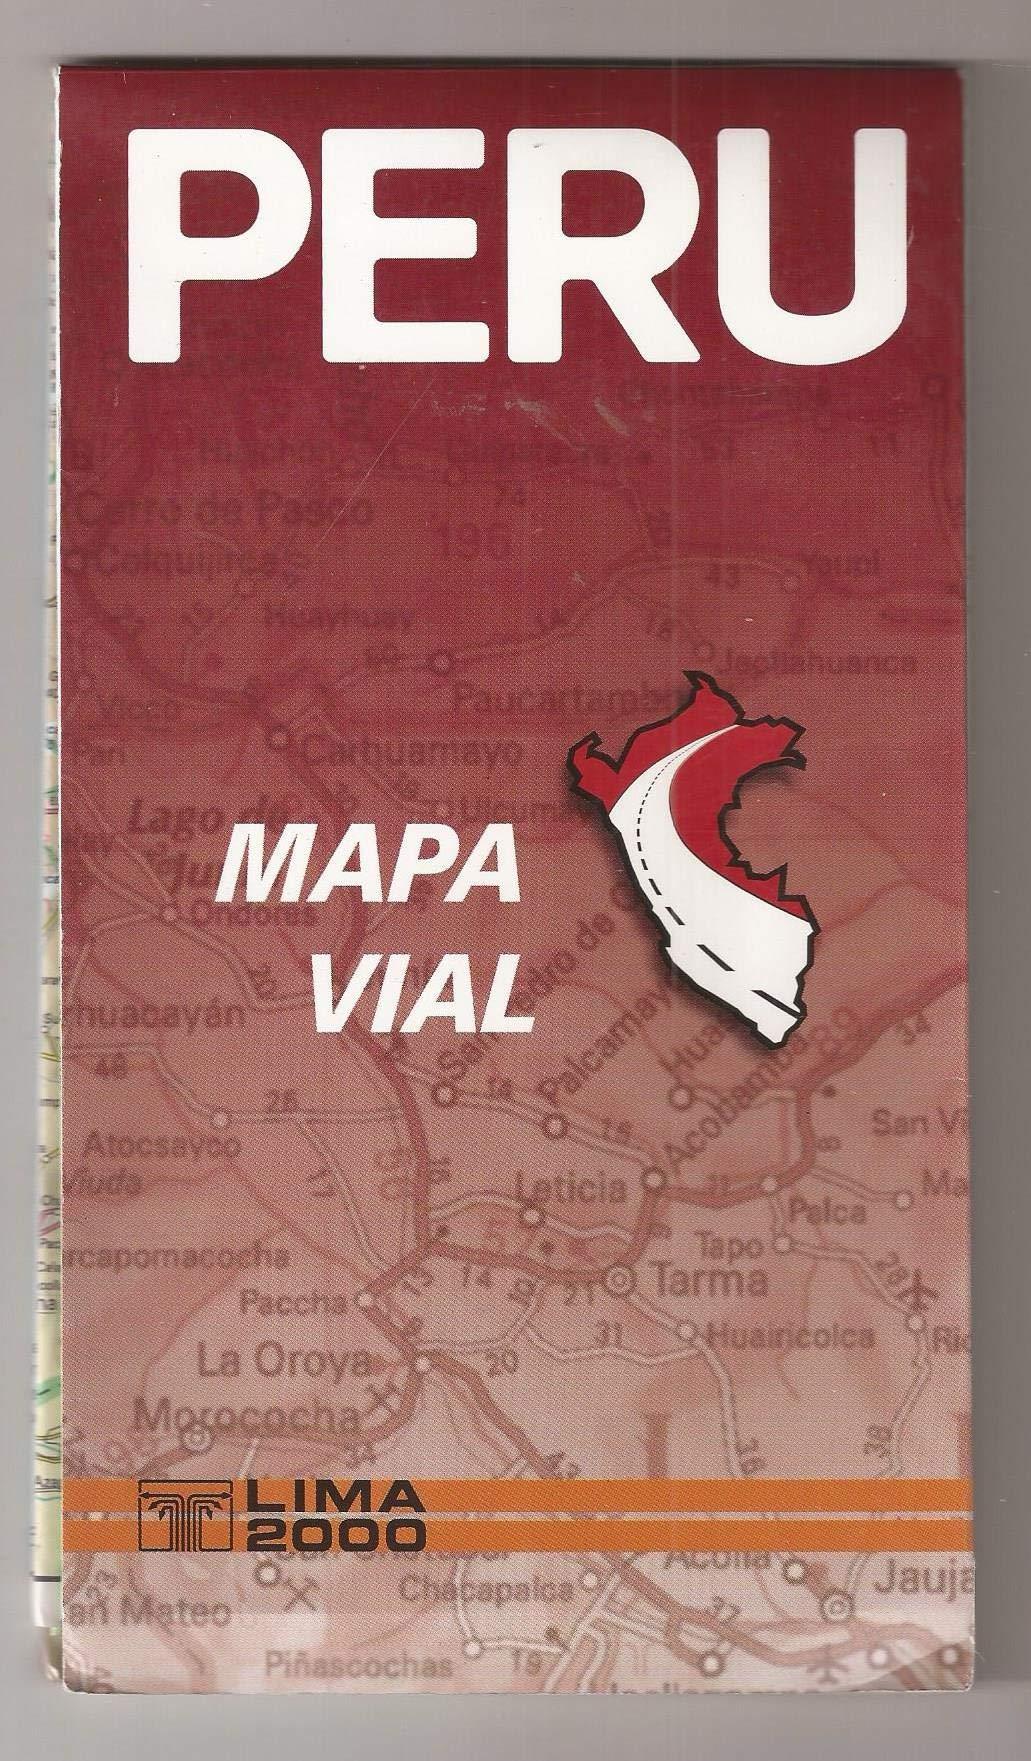 Download Peru Road Map with City Maps / Peru Mapa Vial con planos de ciudades PDF